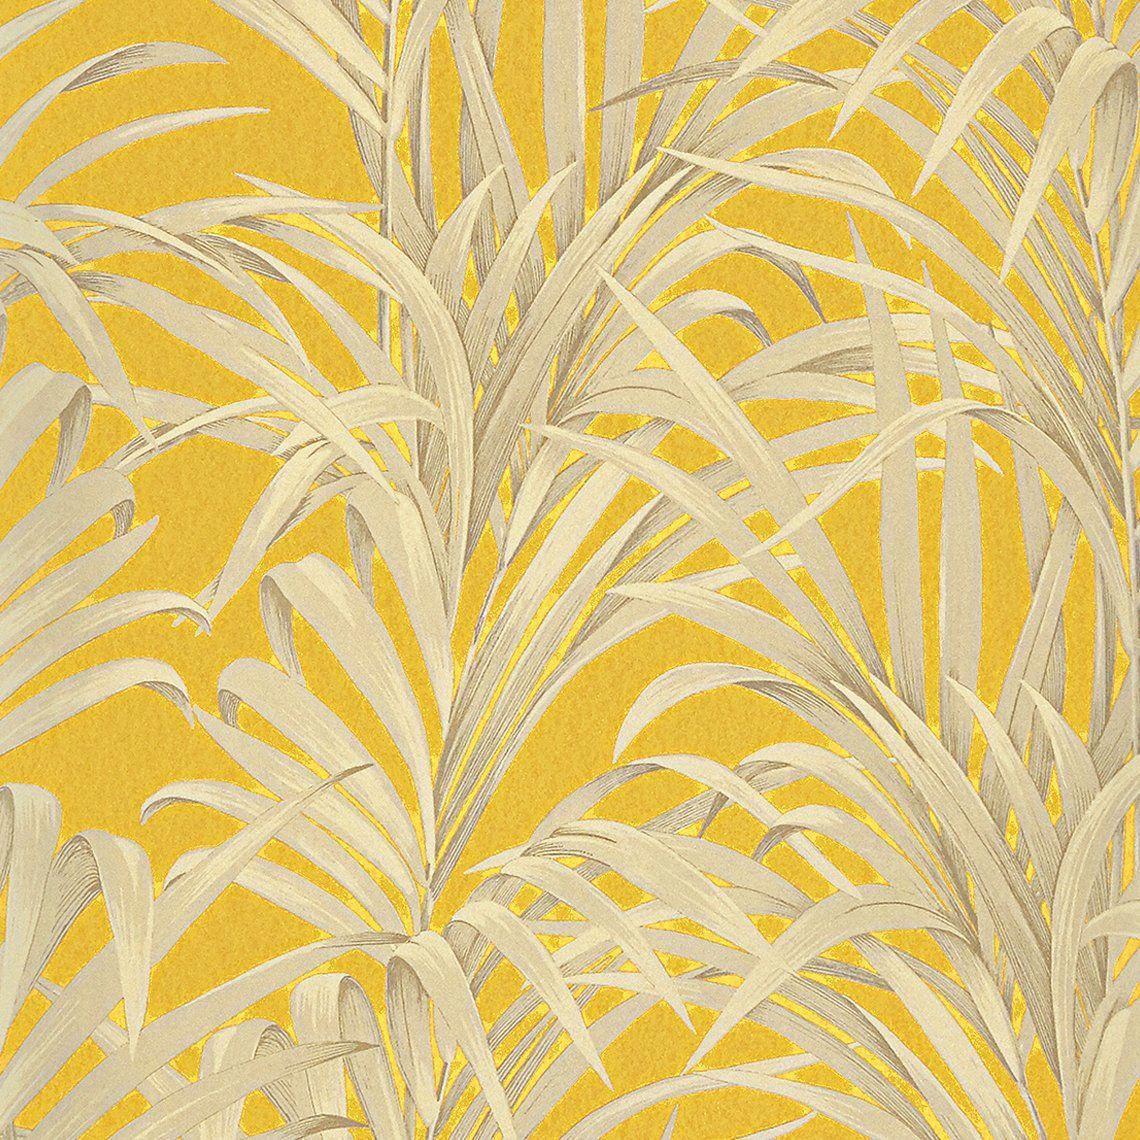 papier peint domitille 100 intiss motif tropical jaune. Black Bedroom Furniture Sets. Home Design Ideas